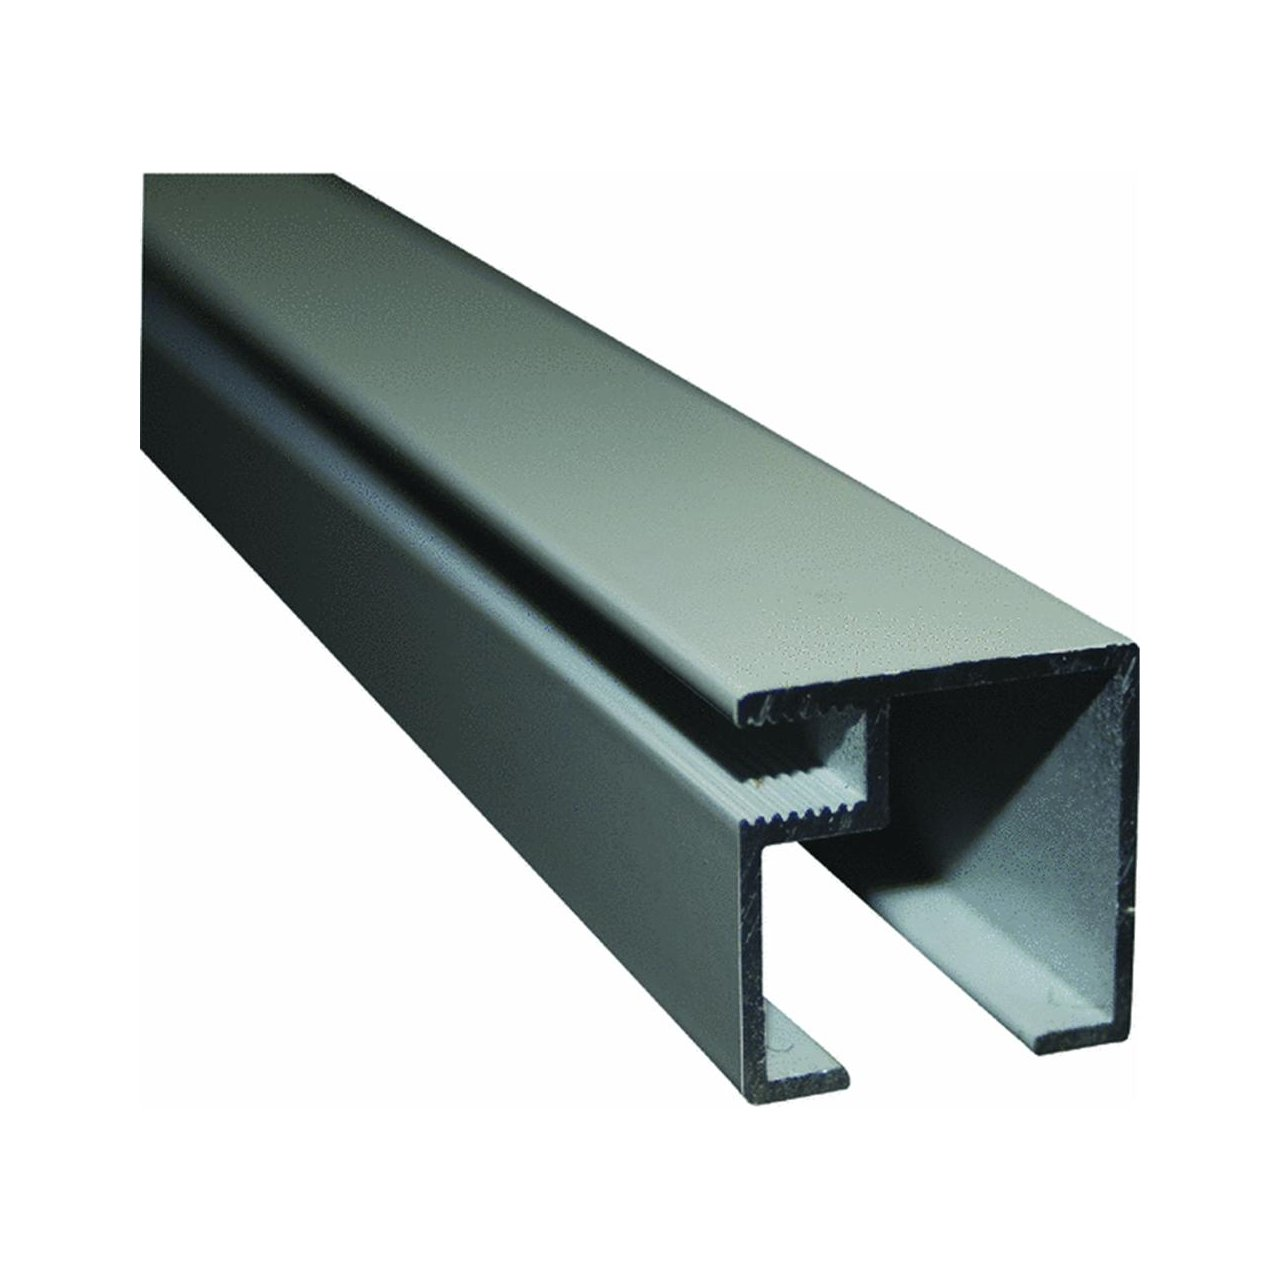 MINItrack White Aluminum Porch Screening System